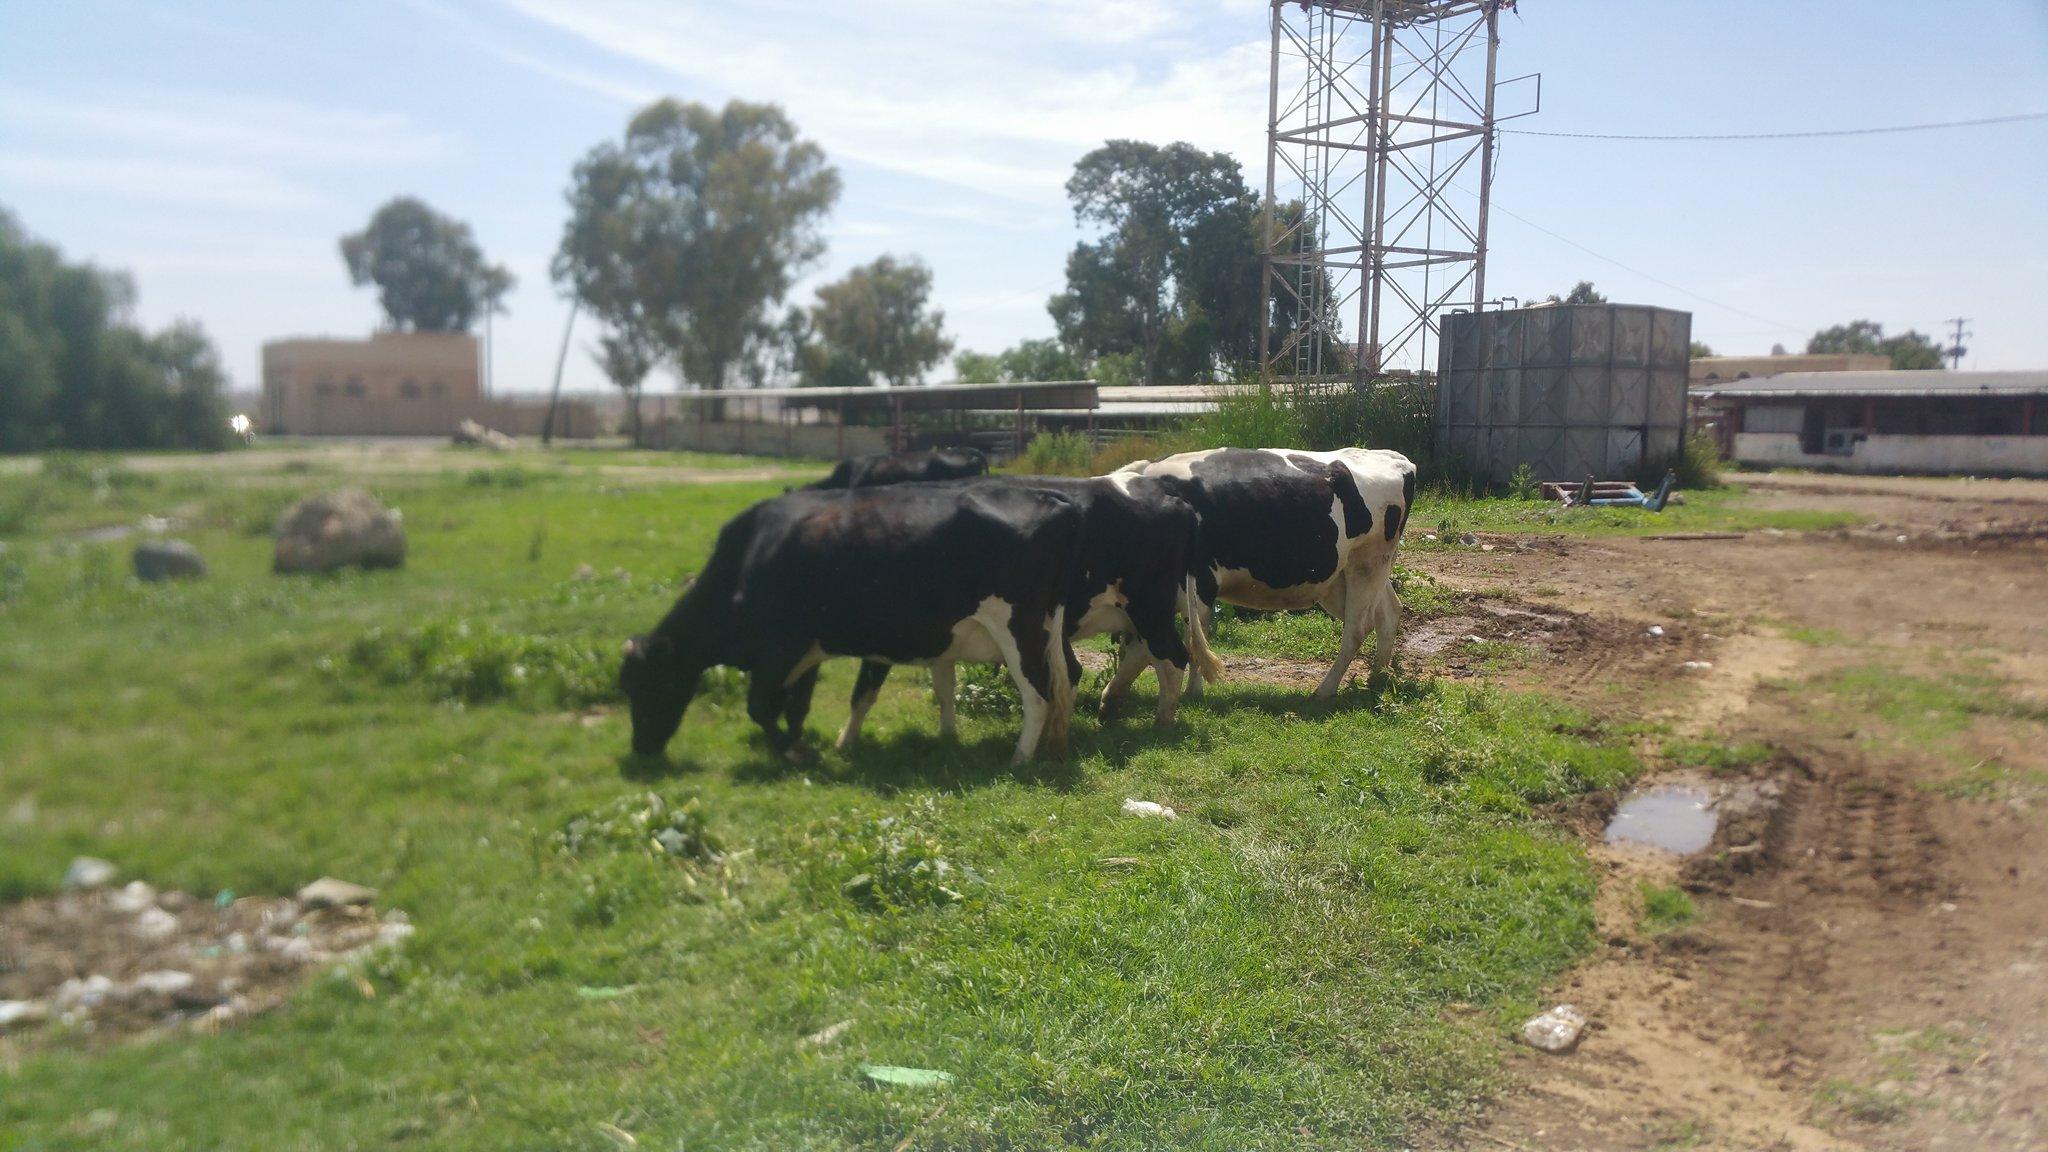 dhamar cows grazing outside farm 10 MAY 2018 OWAP AR Helall pic.jpg